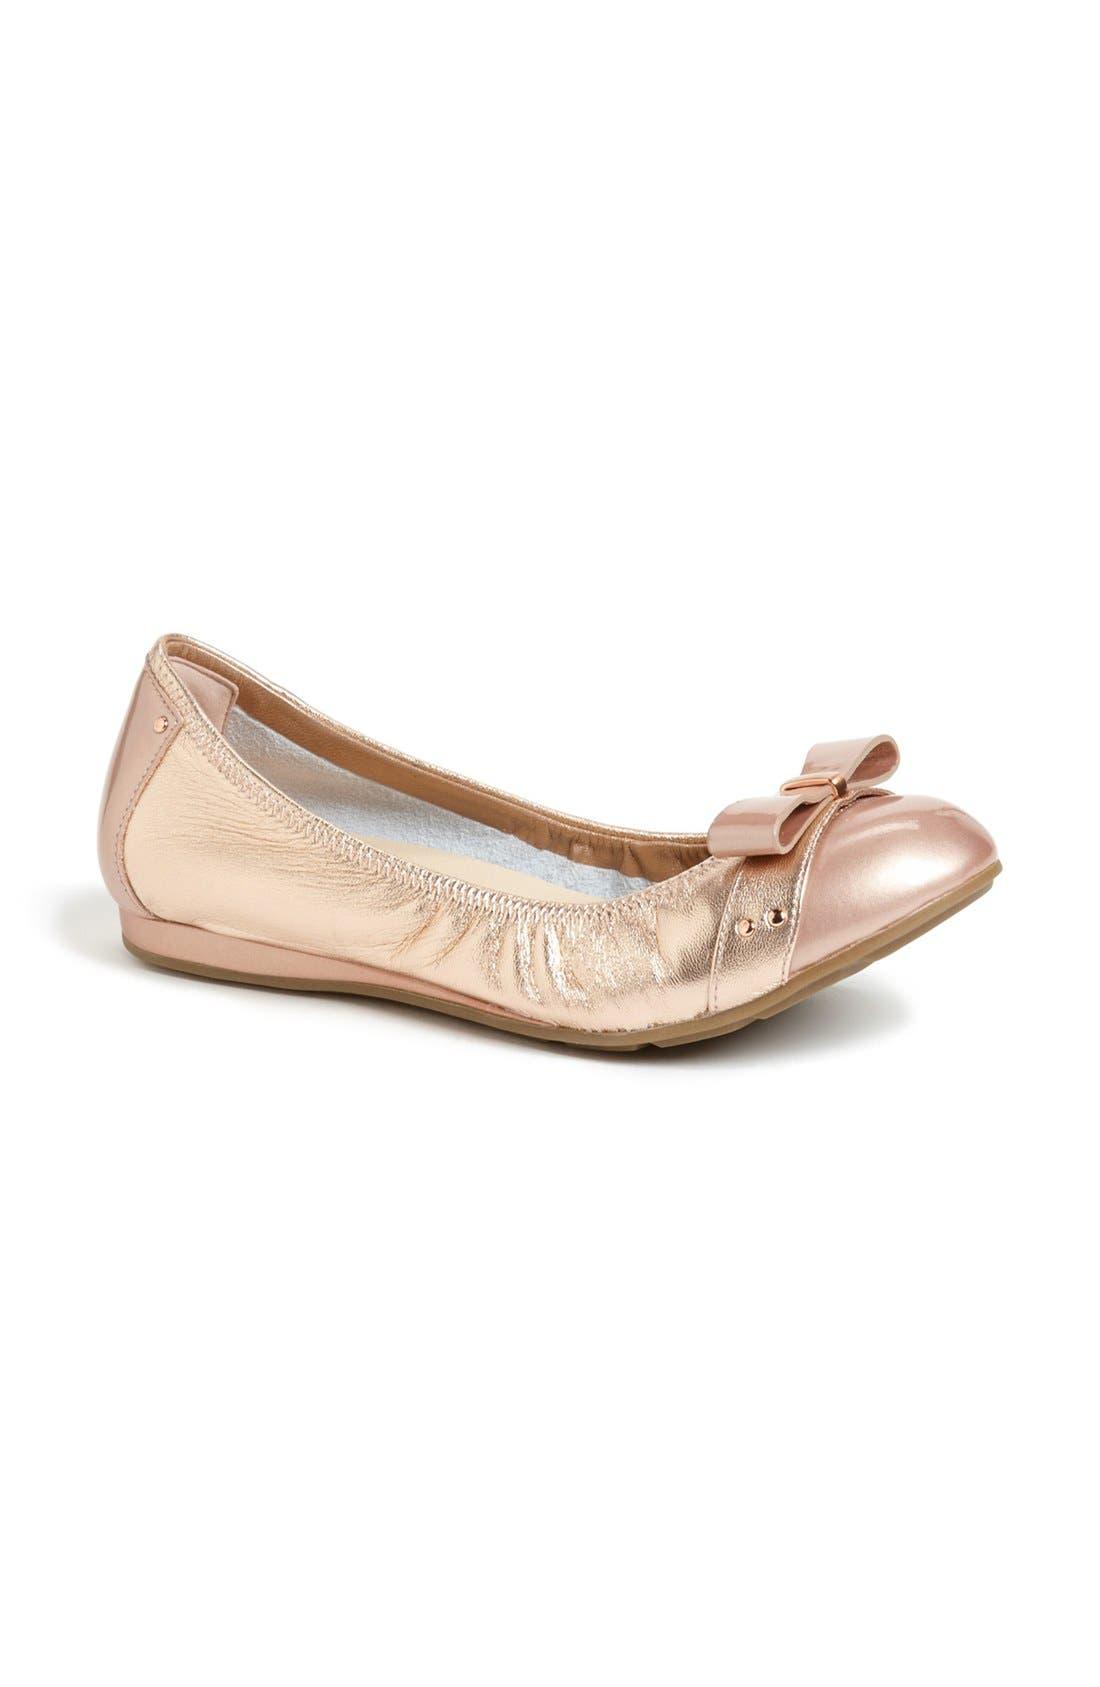 Alternate Image 1 Selected - Cole Haan 'Air Monica' Ballet Flat